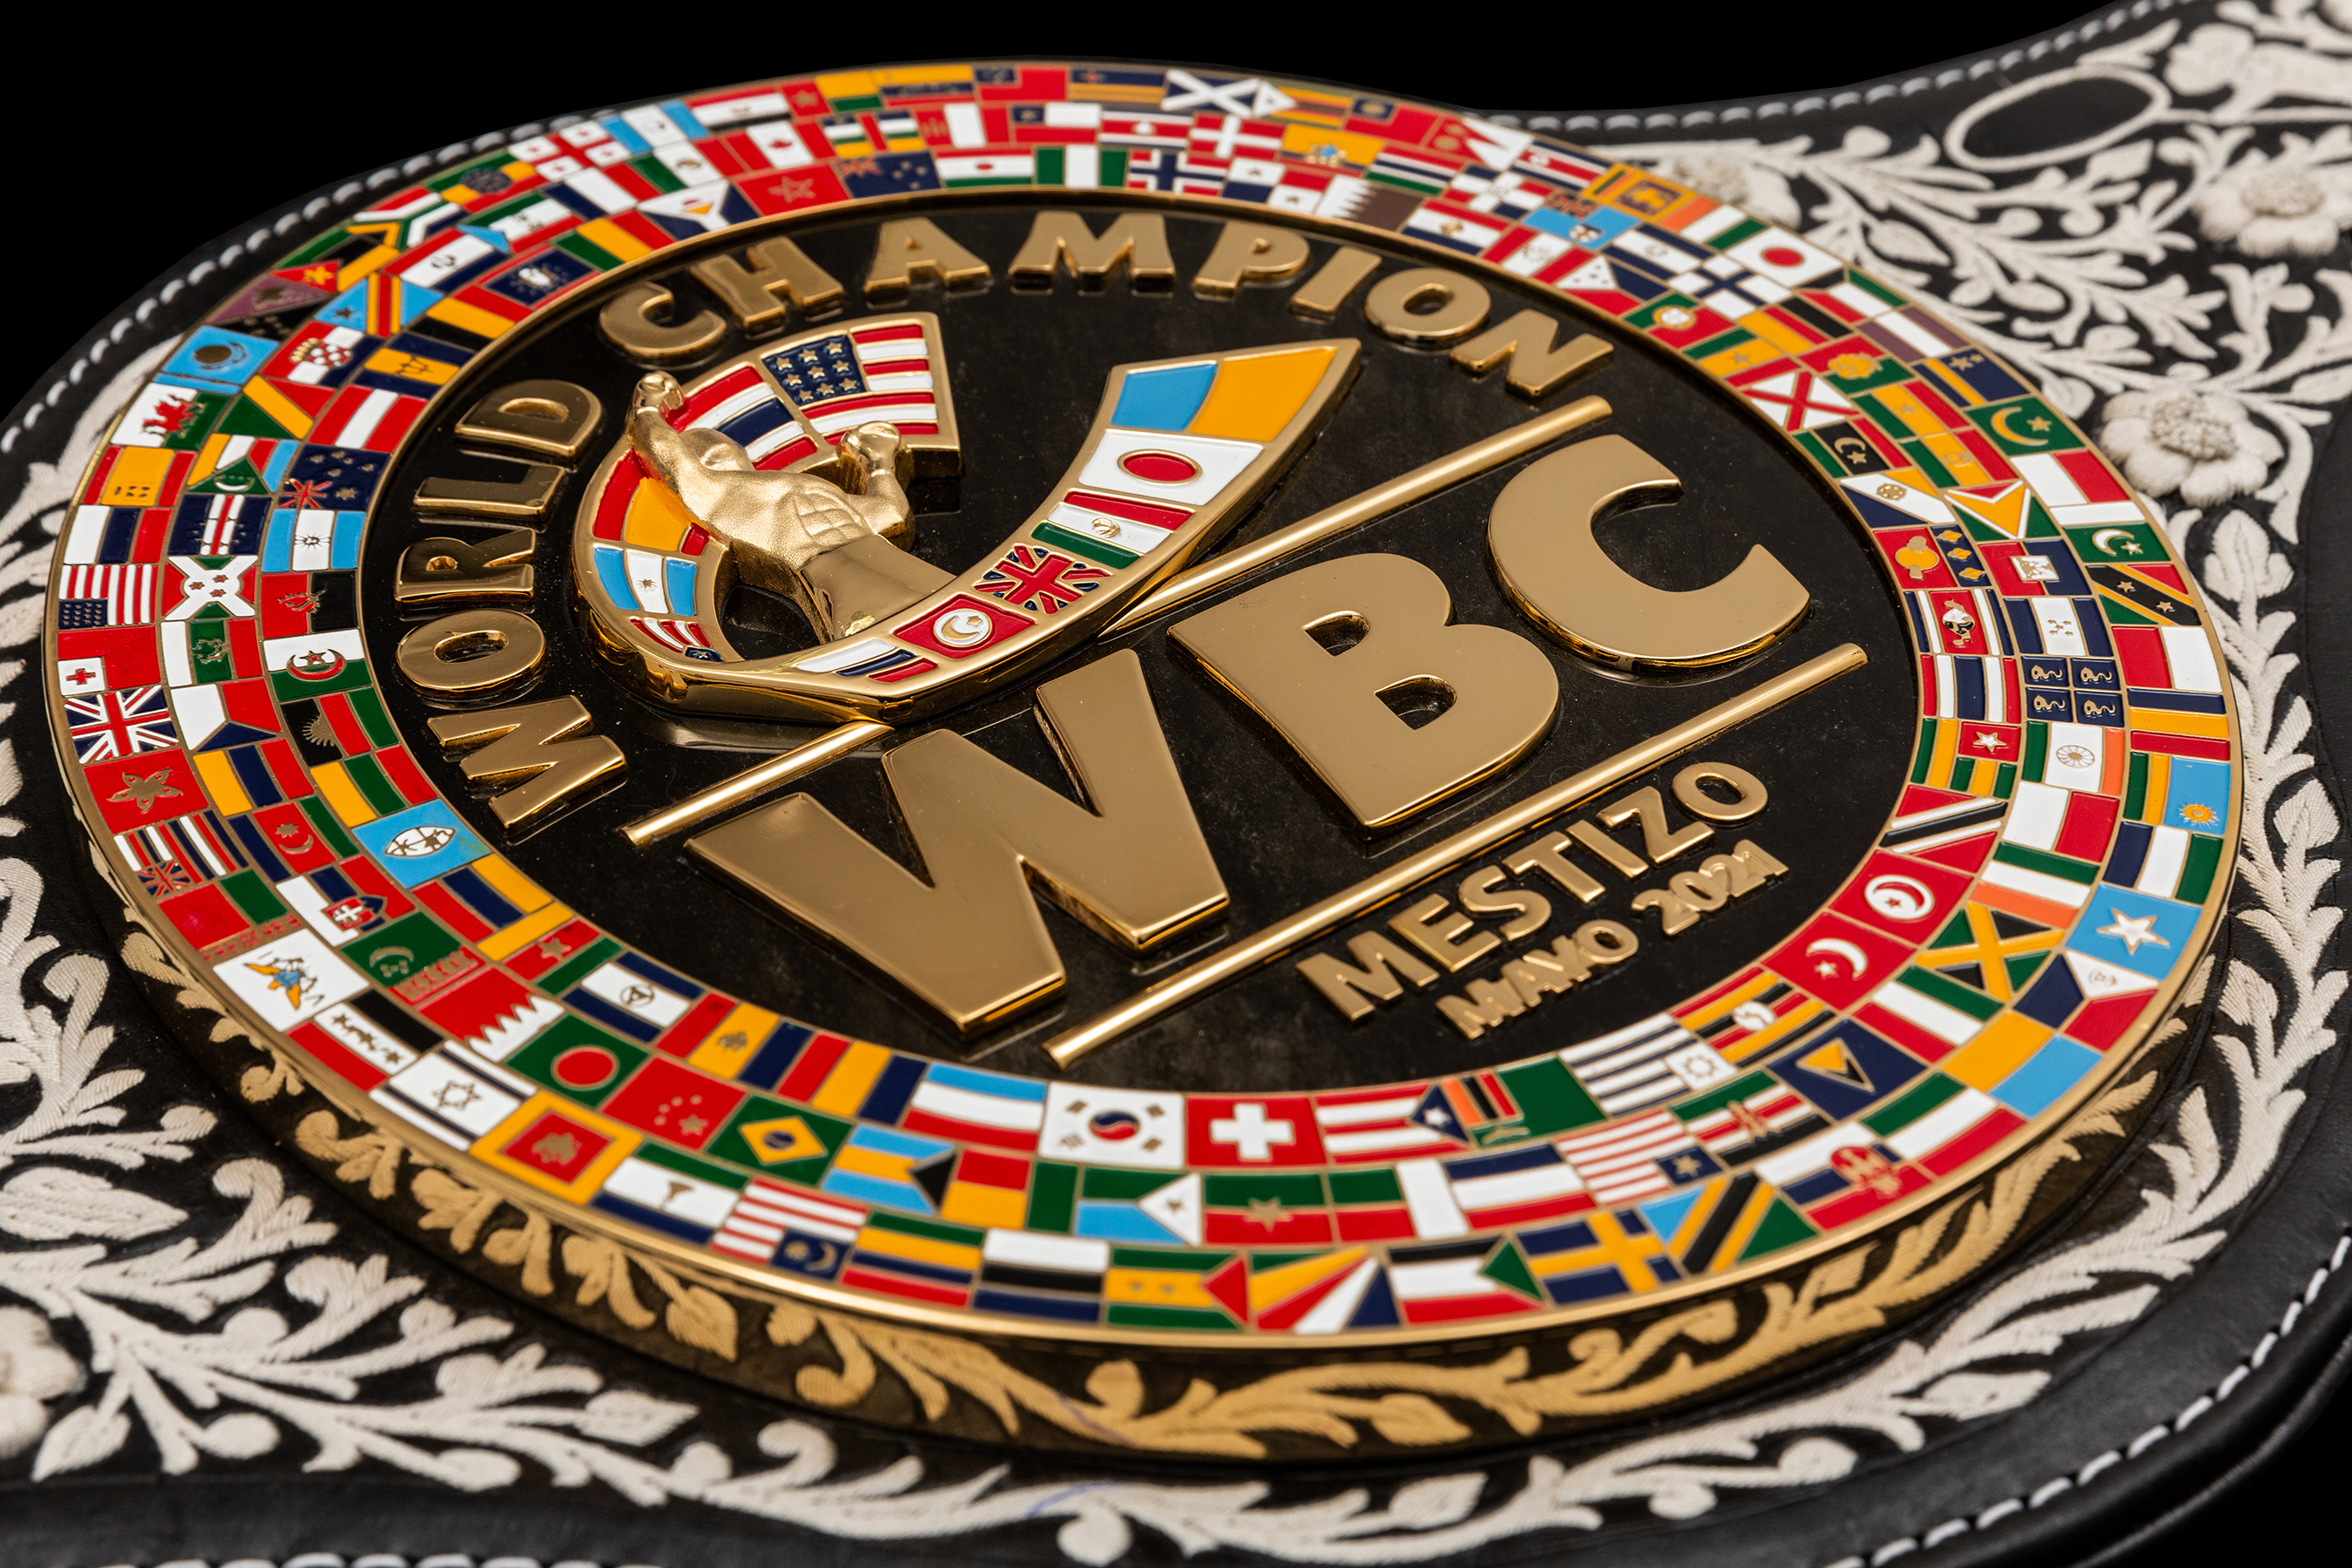 The WBC Mestizo Belt | Boxen247.com